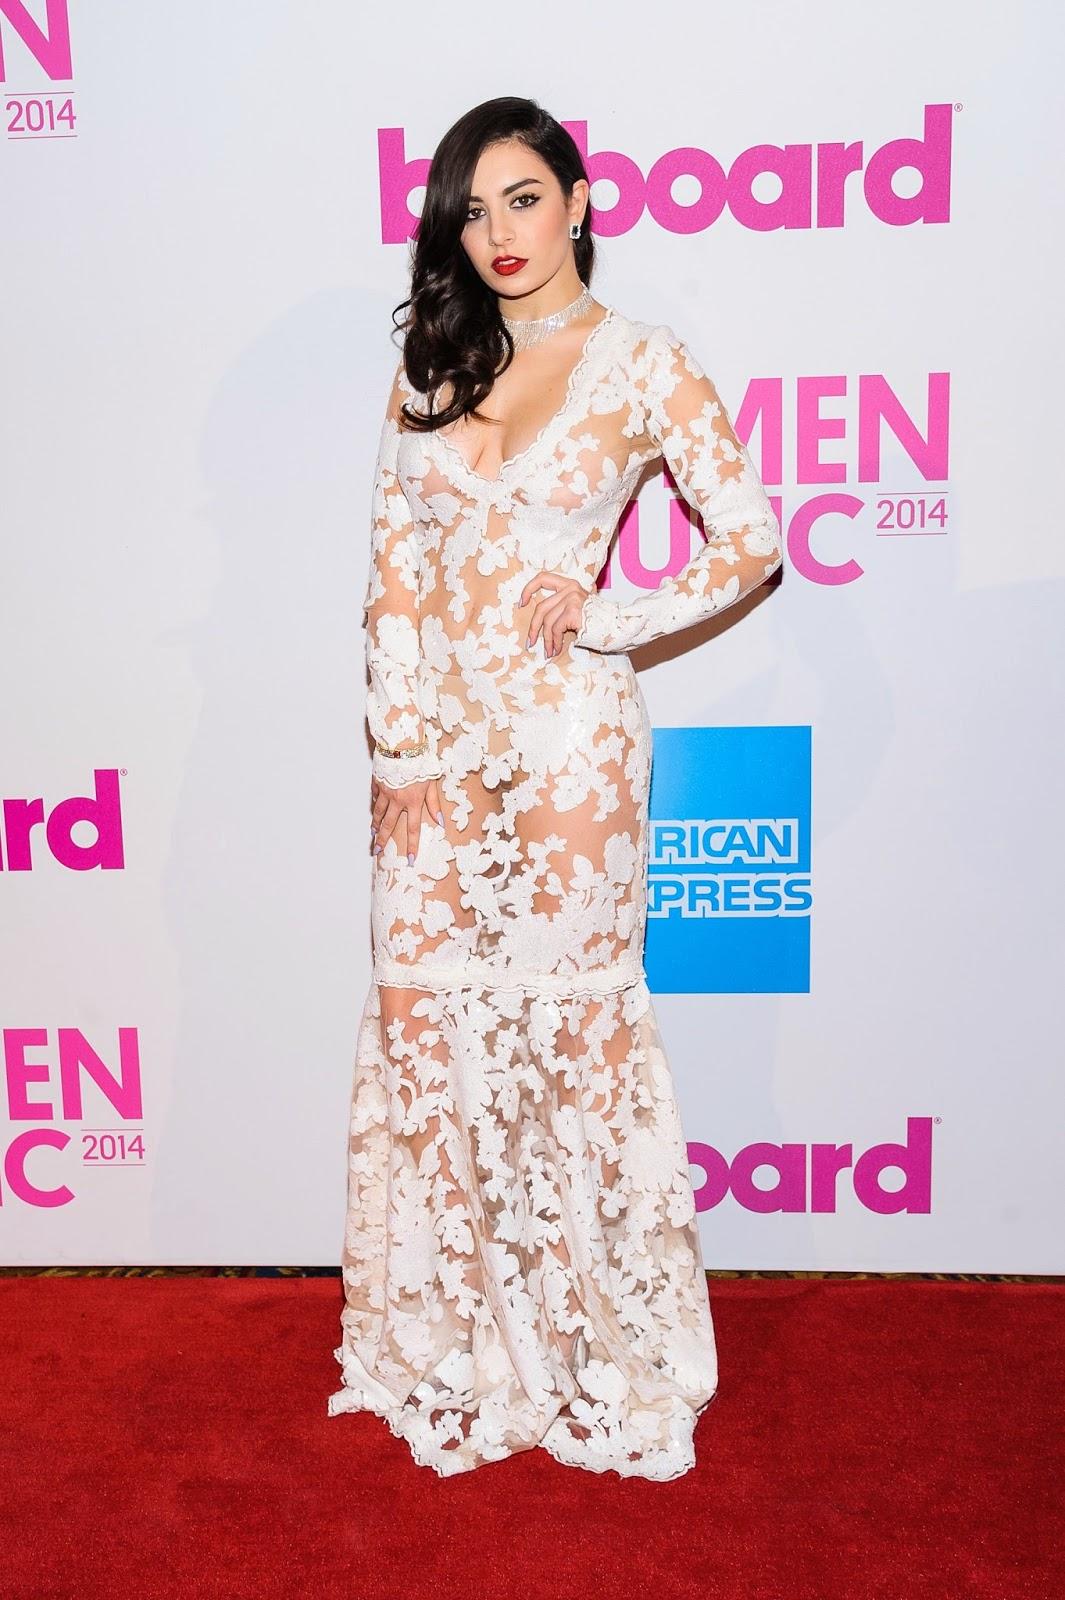 british singer and songwriter, Charli XCX, Hiburan, Hollywood singer, info, novelist, Pakaian Penyanyi British Yang Terlampau Sexy, sensasi, terkini,